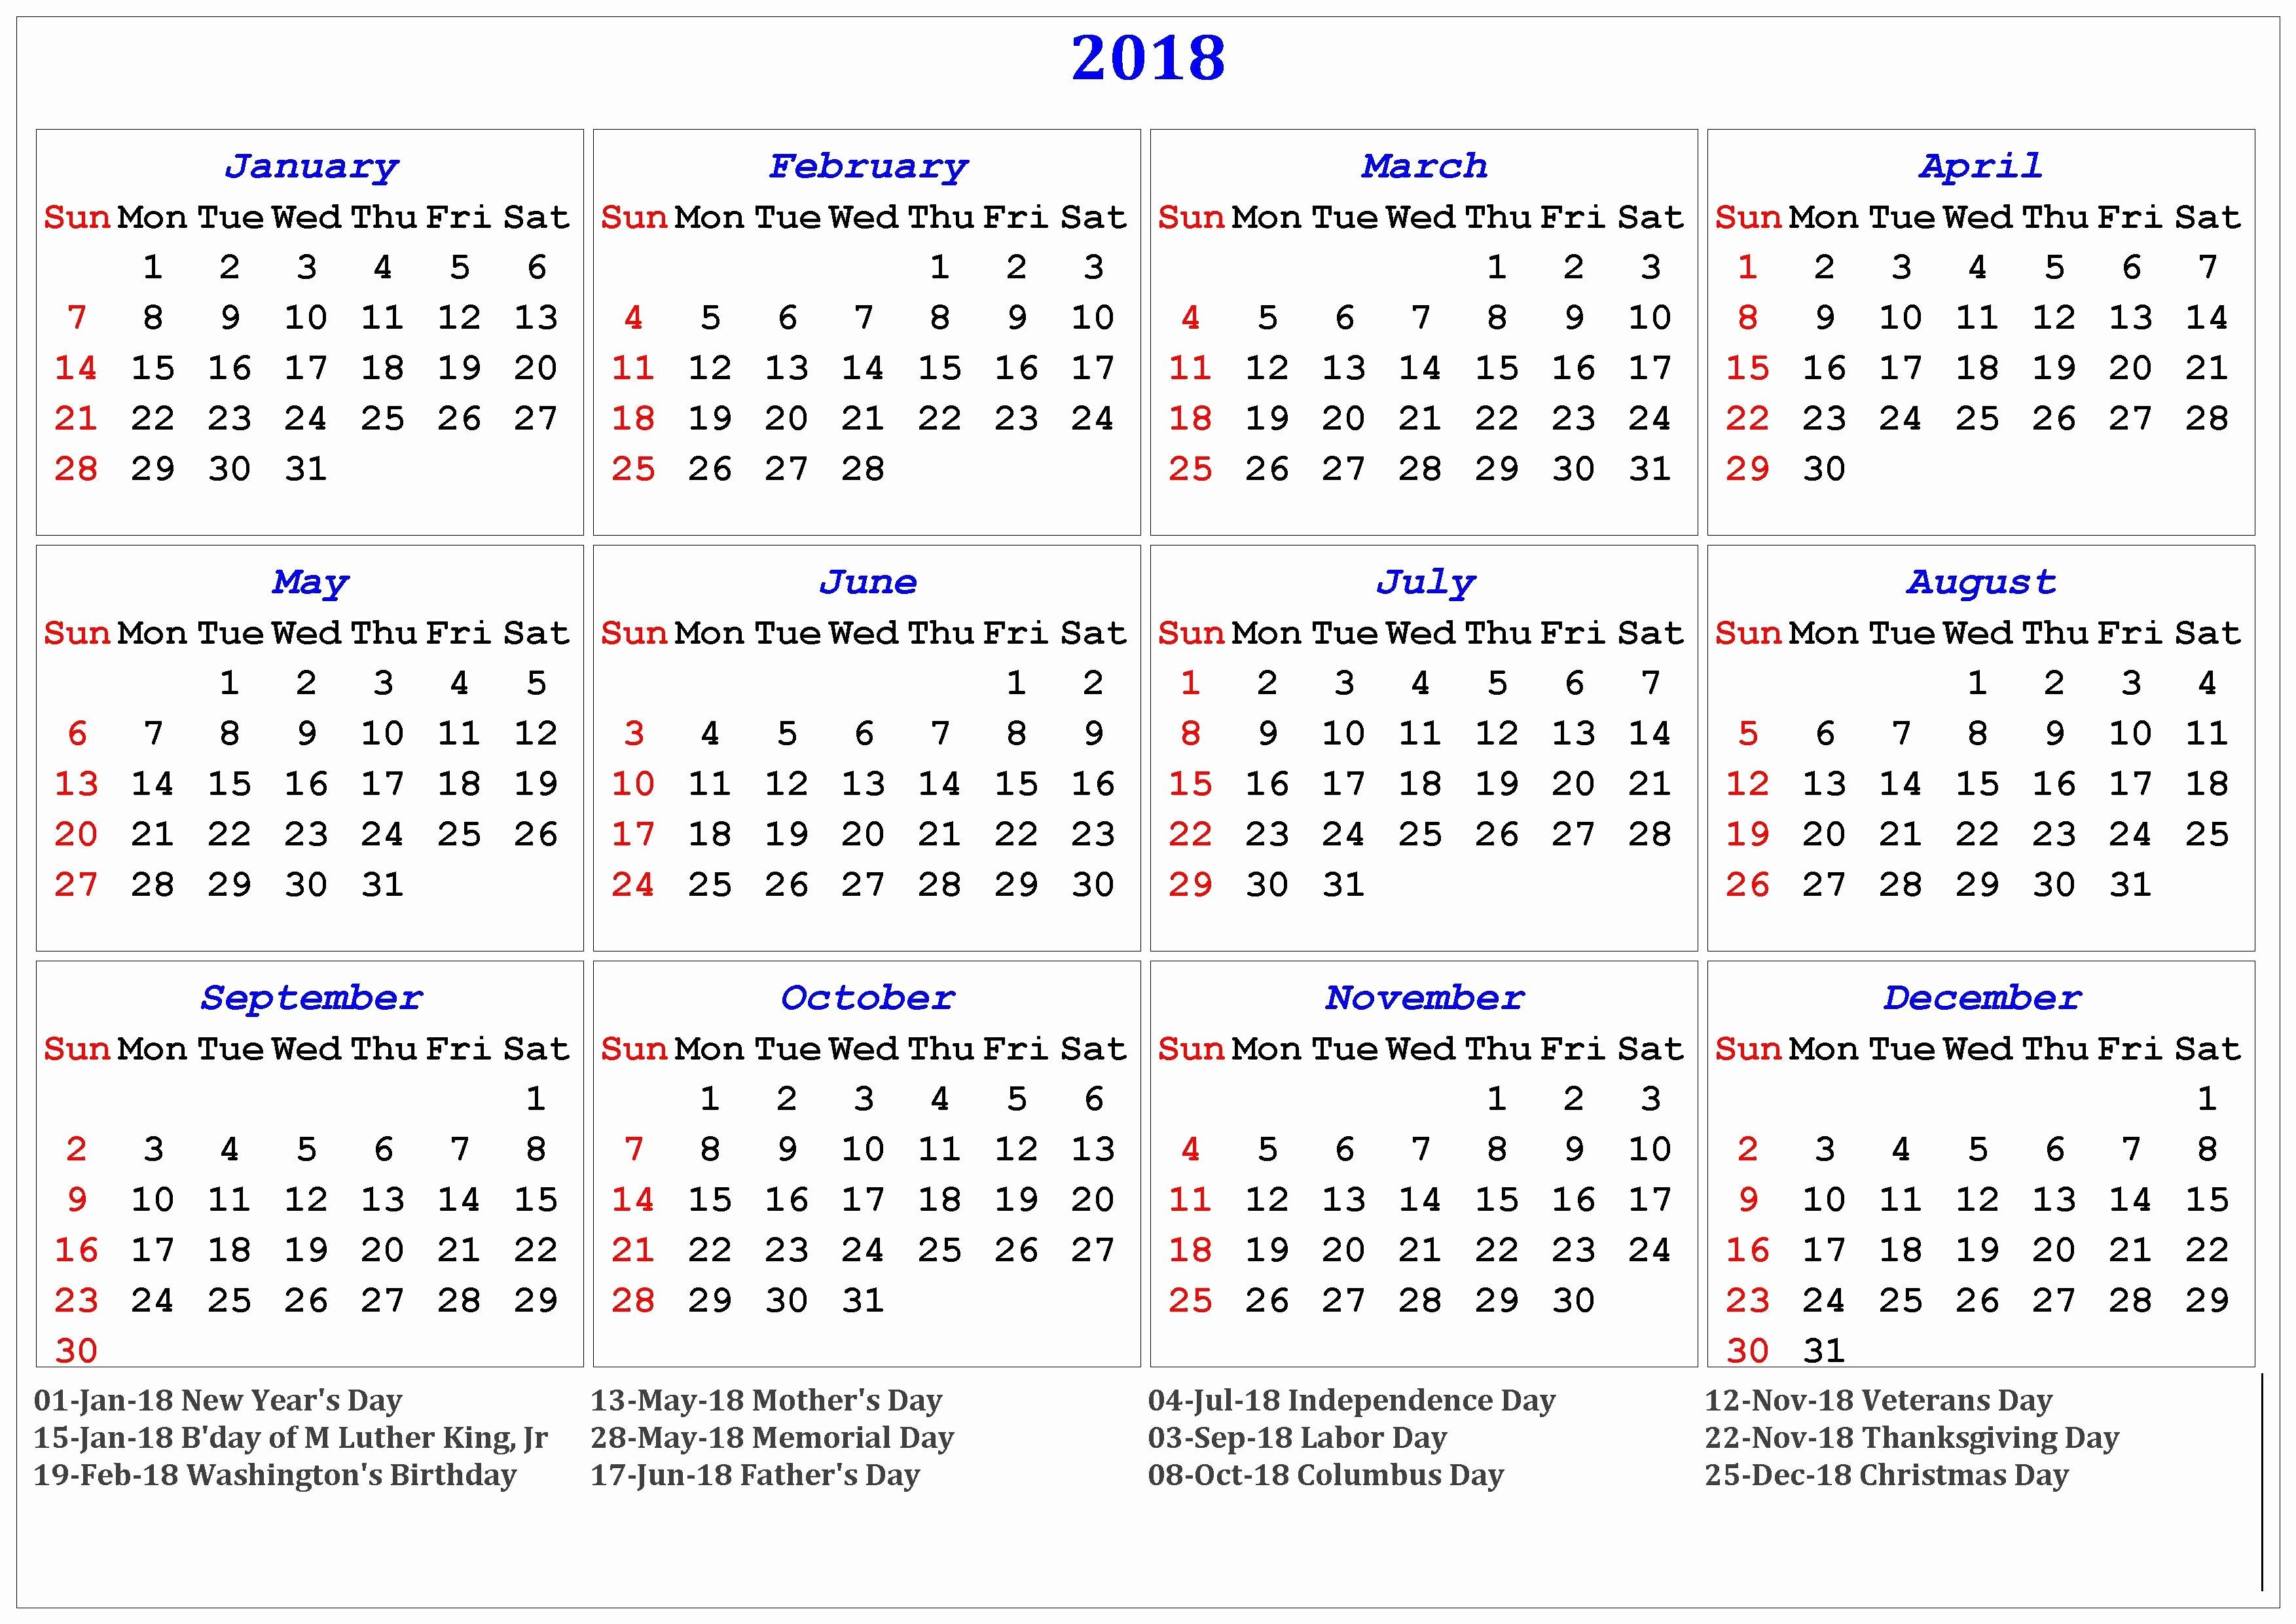 Calendar 2018 Printable with Holidays Luxury 2018 Printable Calendar with Us & Uk Holidays